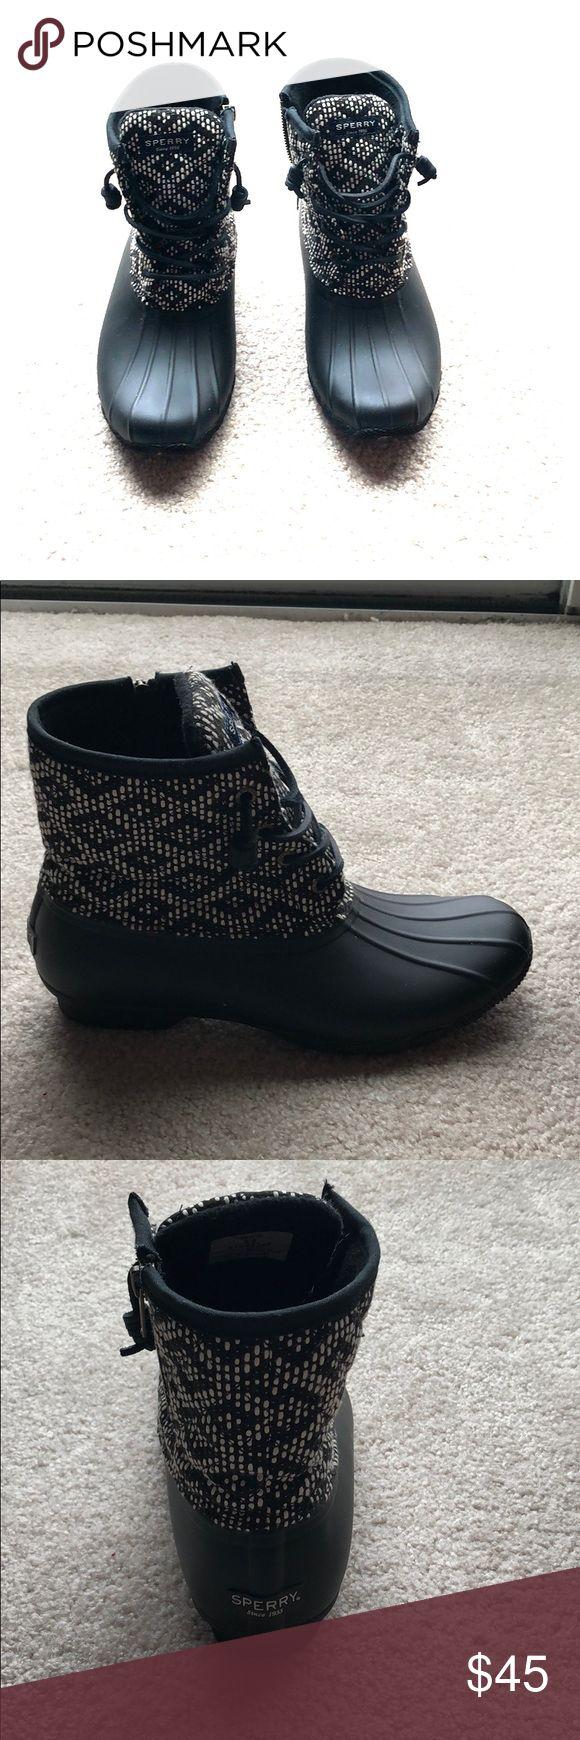 Sperry Duck Boots Women's Sperry Heavy Linen Duck Boots. Waterproof. Insulated & warm. Black & white heavy linen upper. Worn just a handful of times. Sperry Shoes Winter & Rain Boots